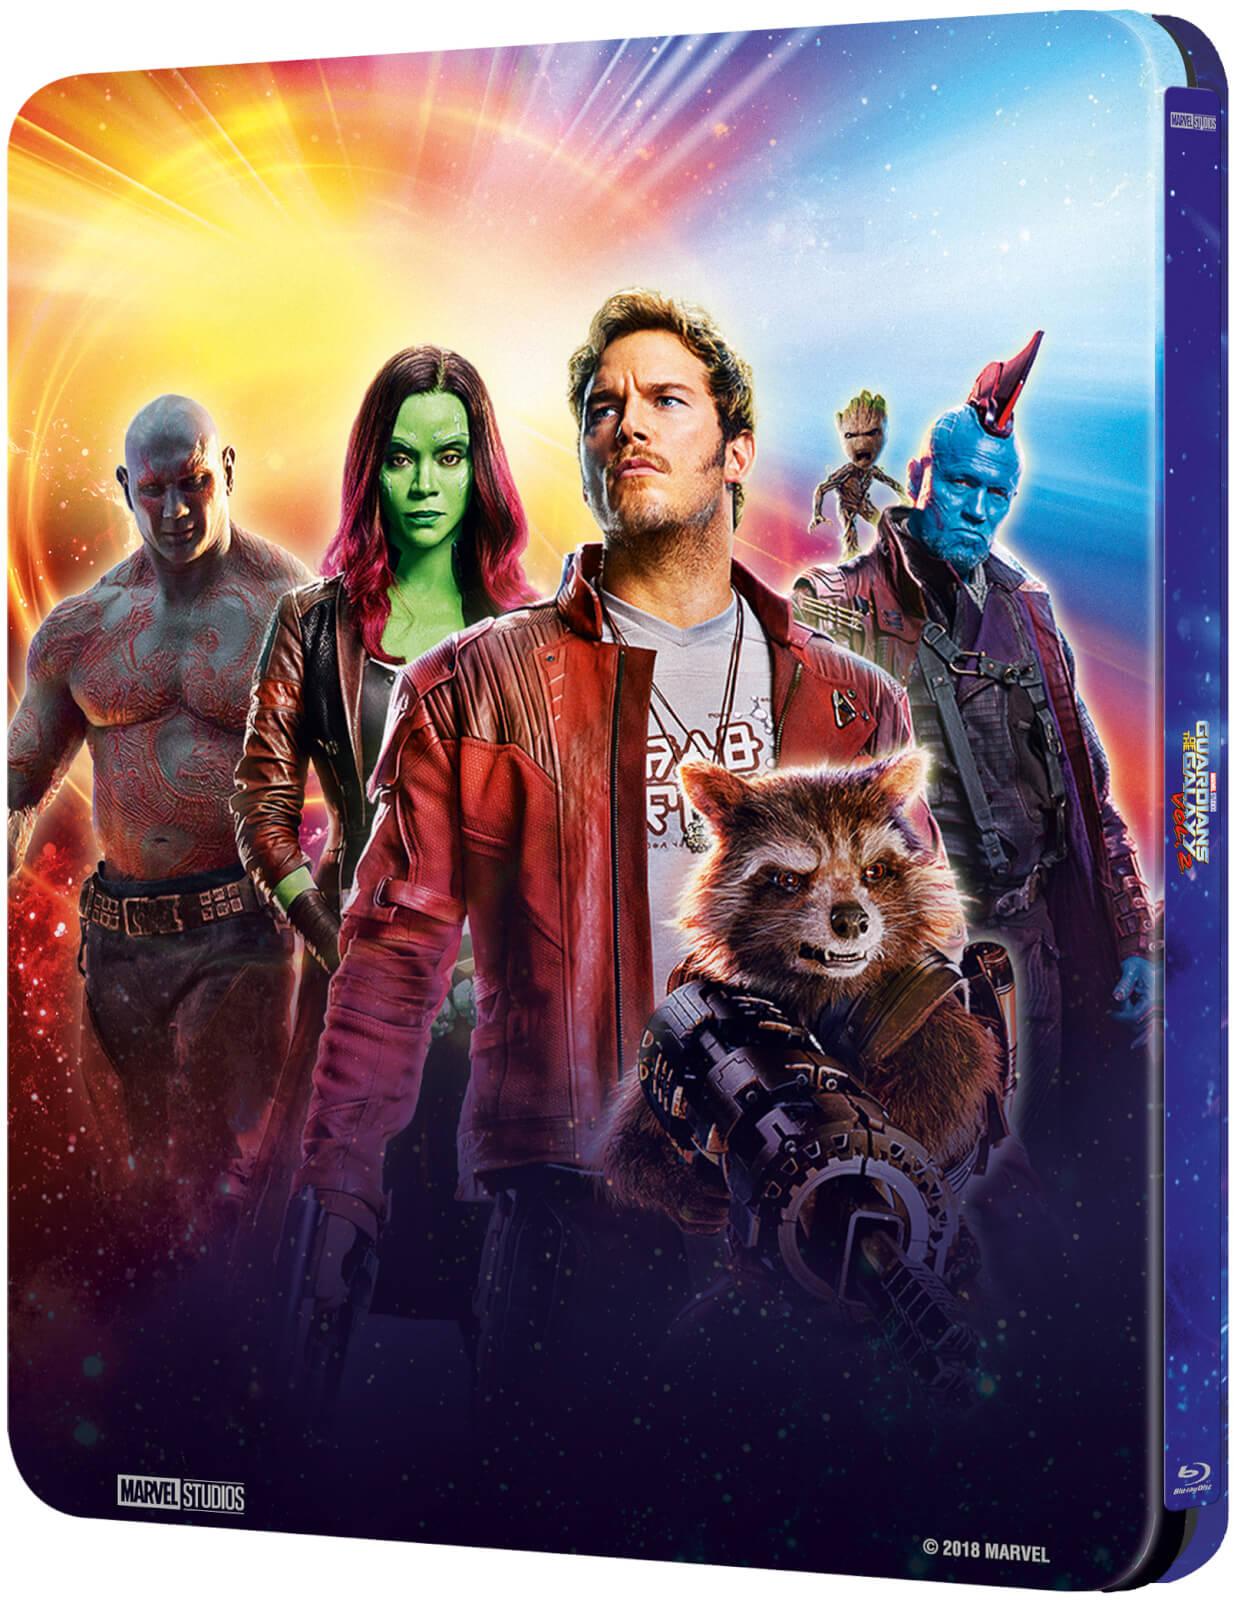 Guardians of the Galaxy Vol. 2 SteelBook back